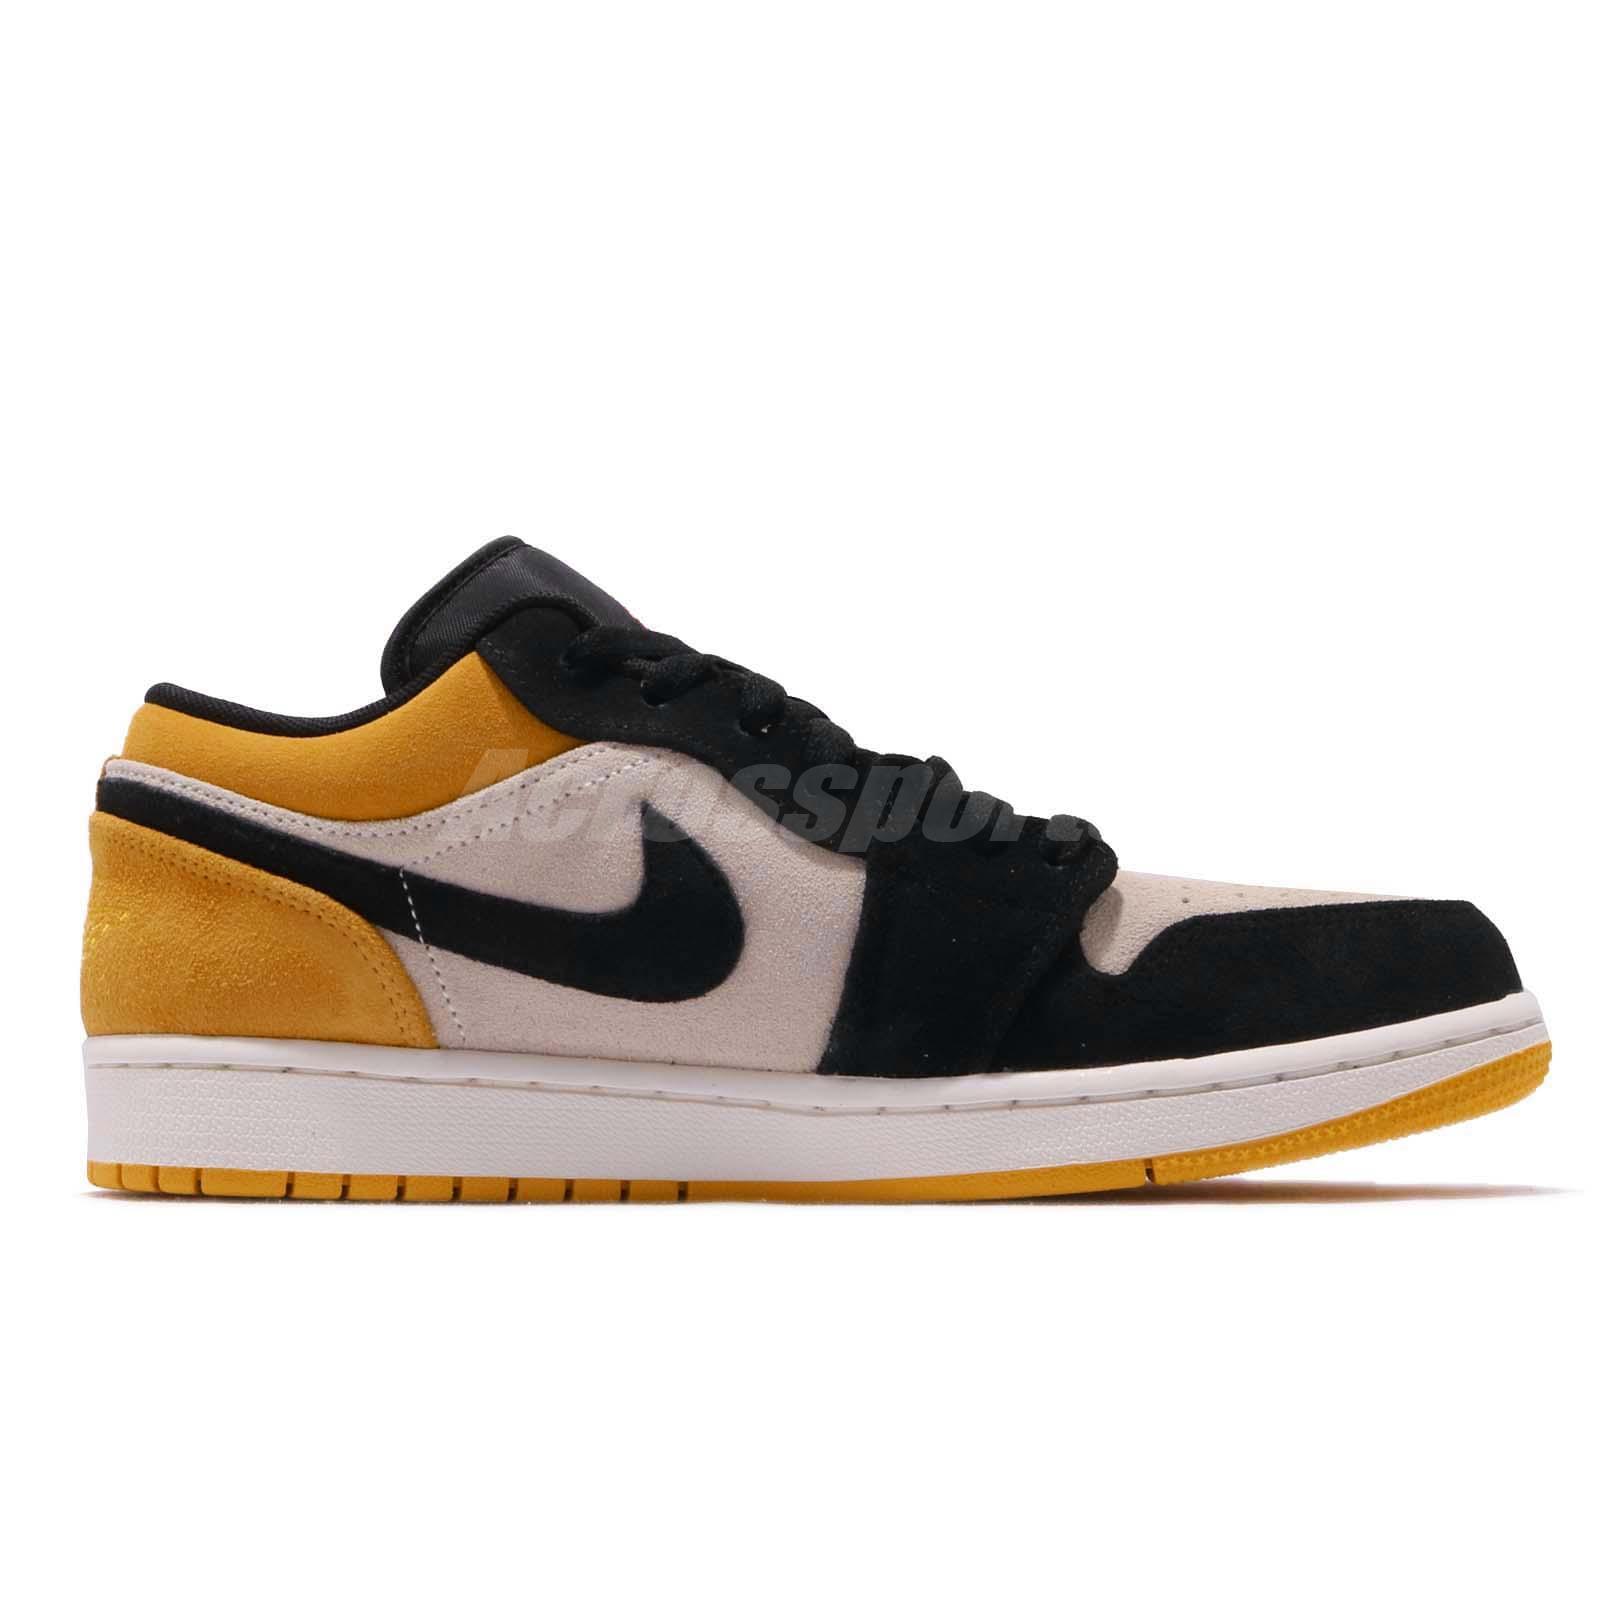 61a3cb4a016c3a Nike Air Jordan 1 Low I AJ1 Sail University Gold Black Men Shoes ...